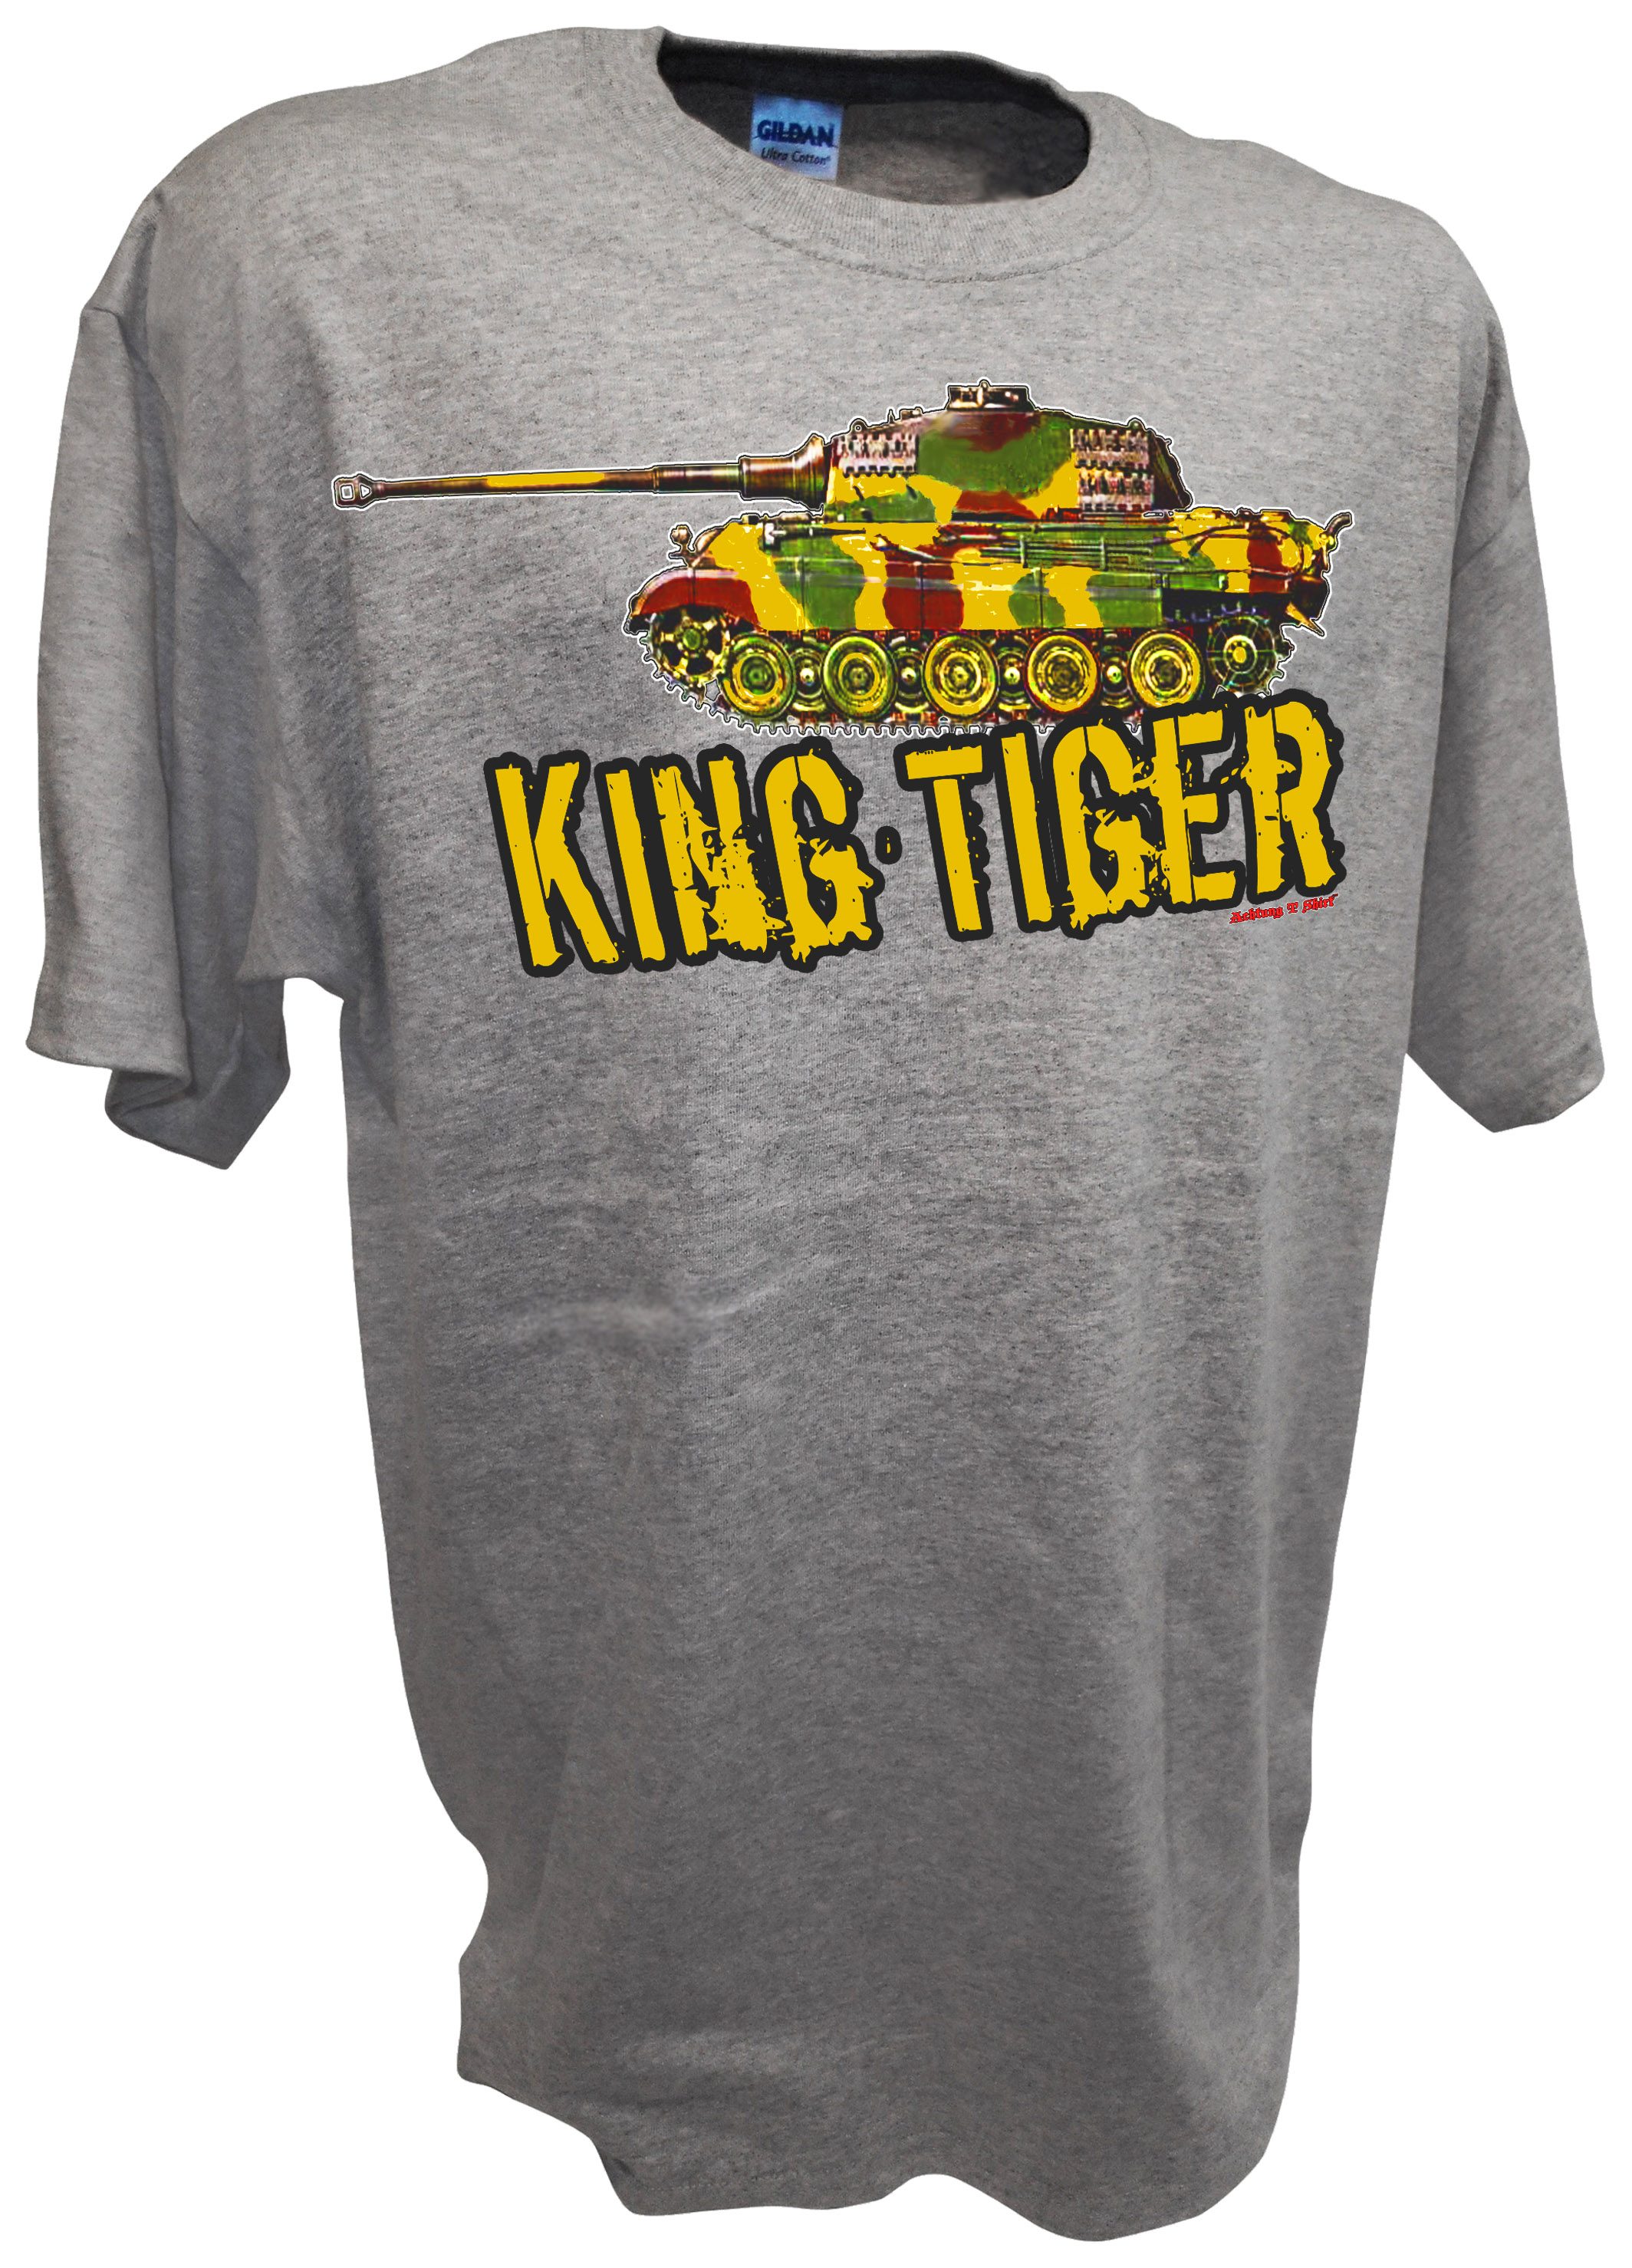 King Tiger Konistiger Tiger Tank German Rc Ww Panzer Spt